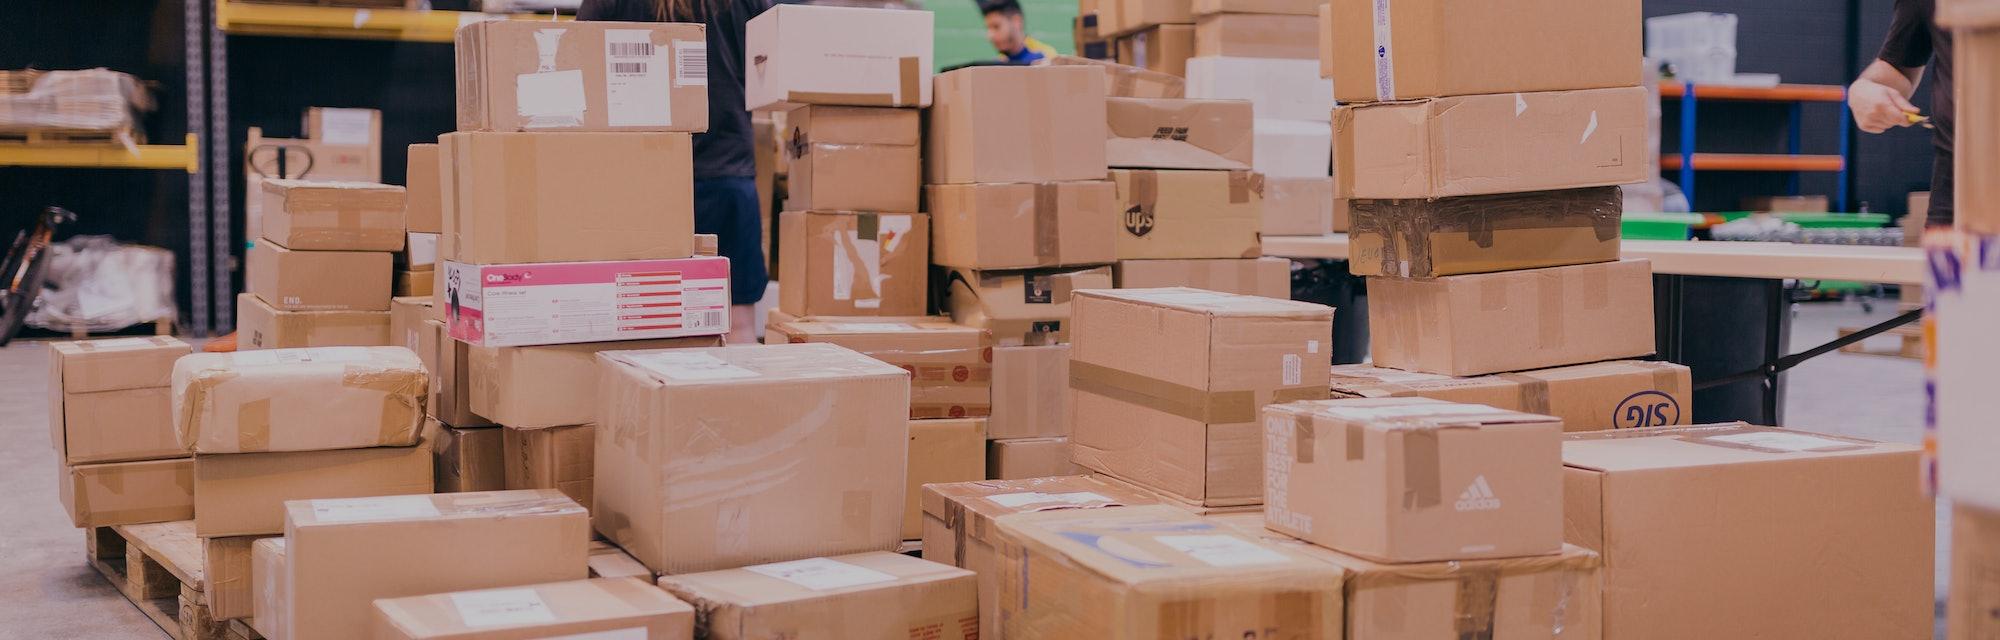 StockX Detroit Warehouse